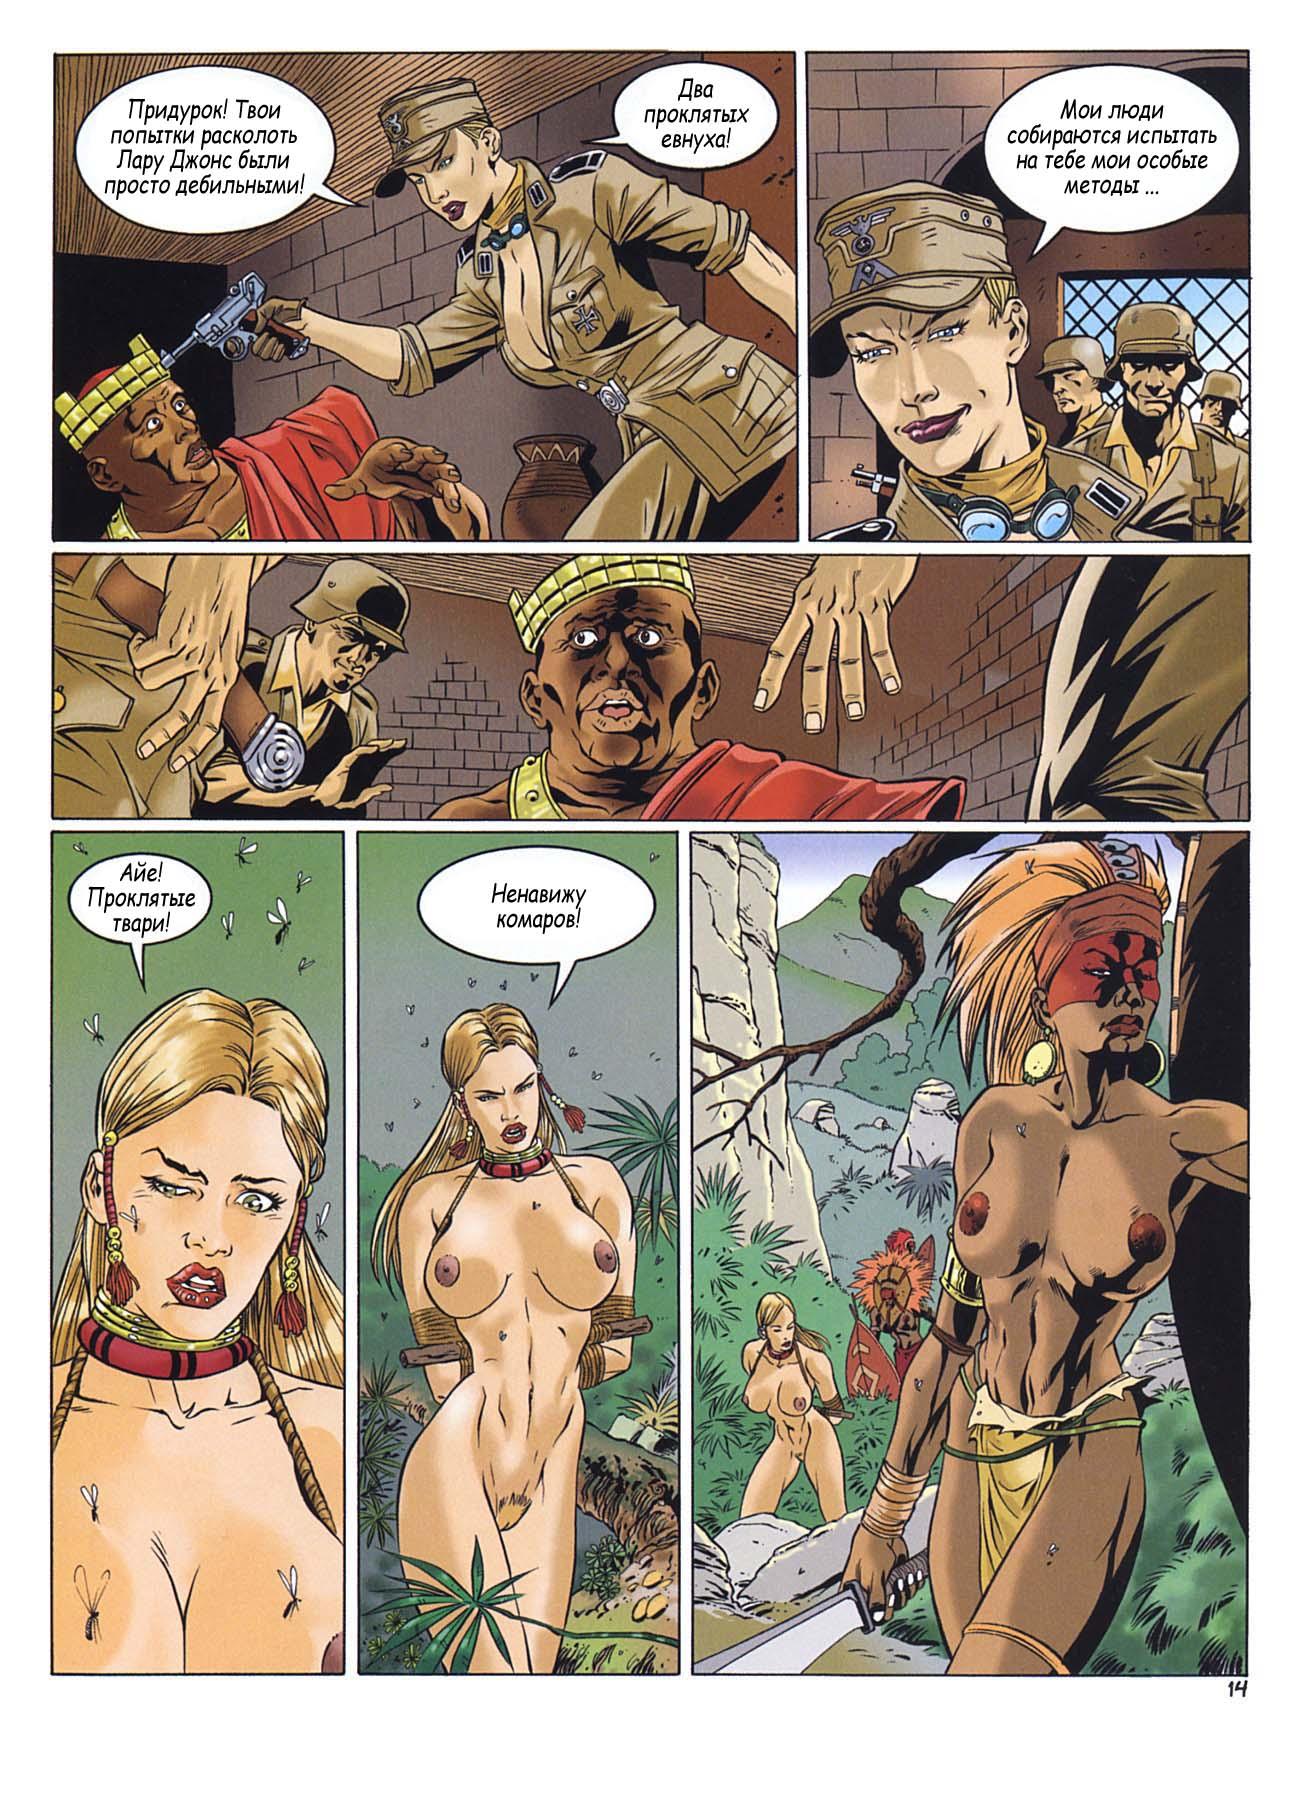 лару крофт трахнули два транса порно комикс